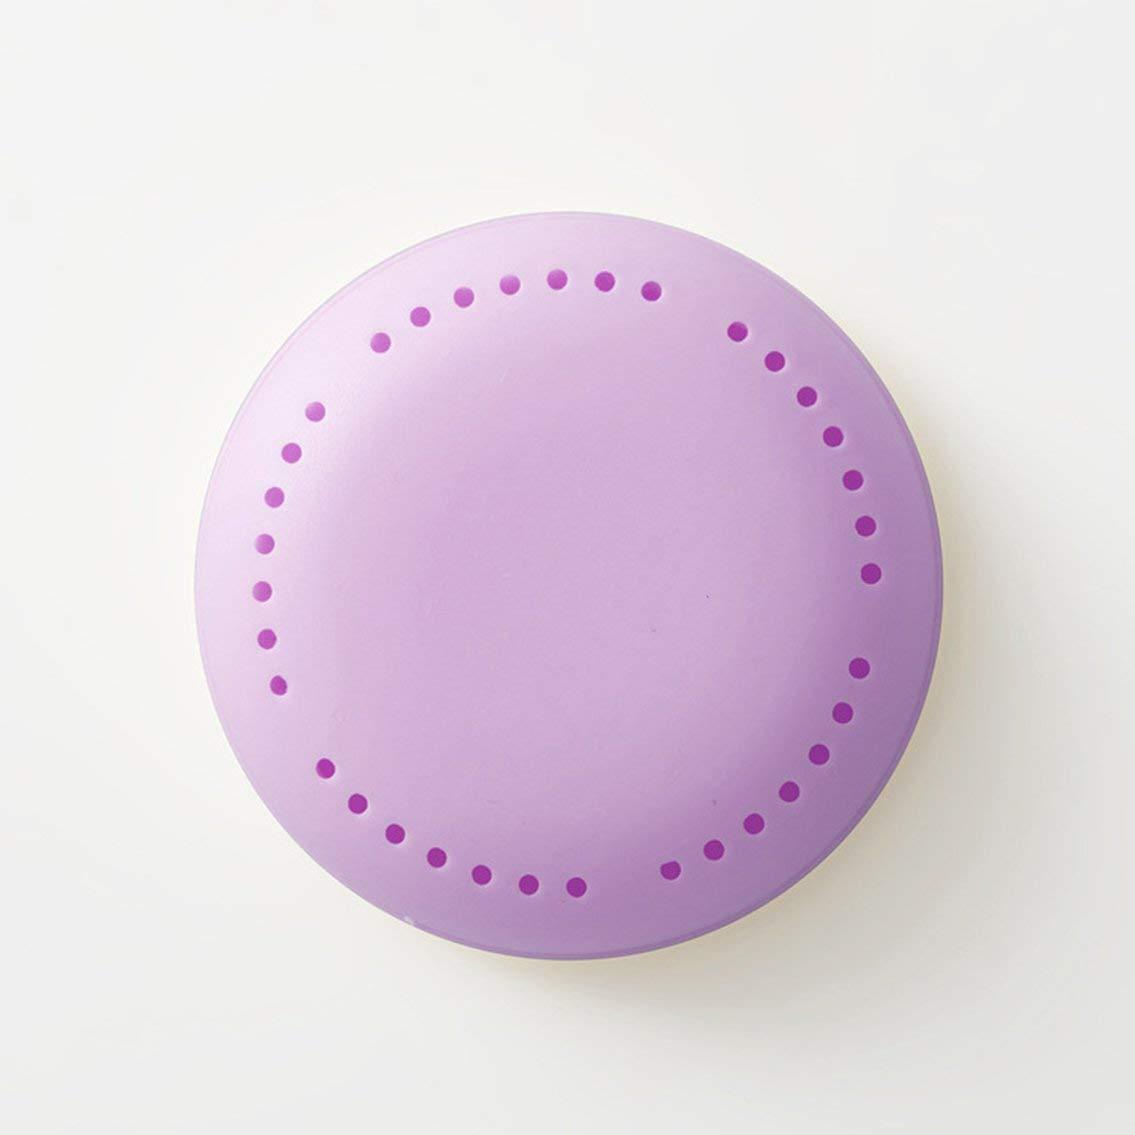 Mazur Natural Adhesive Candy Color Wardrobe Aromatherapy Box Anti-Molding Deworming Shoe Wardrobe Deodorant Deodorization Box(Lavender purple)